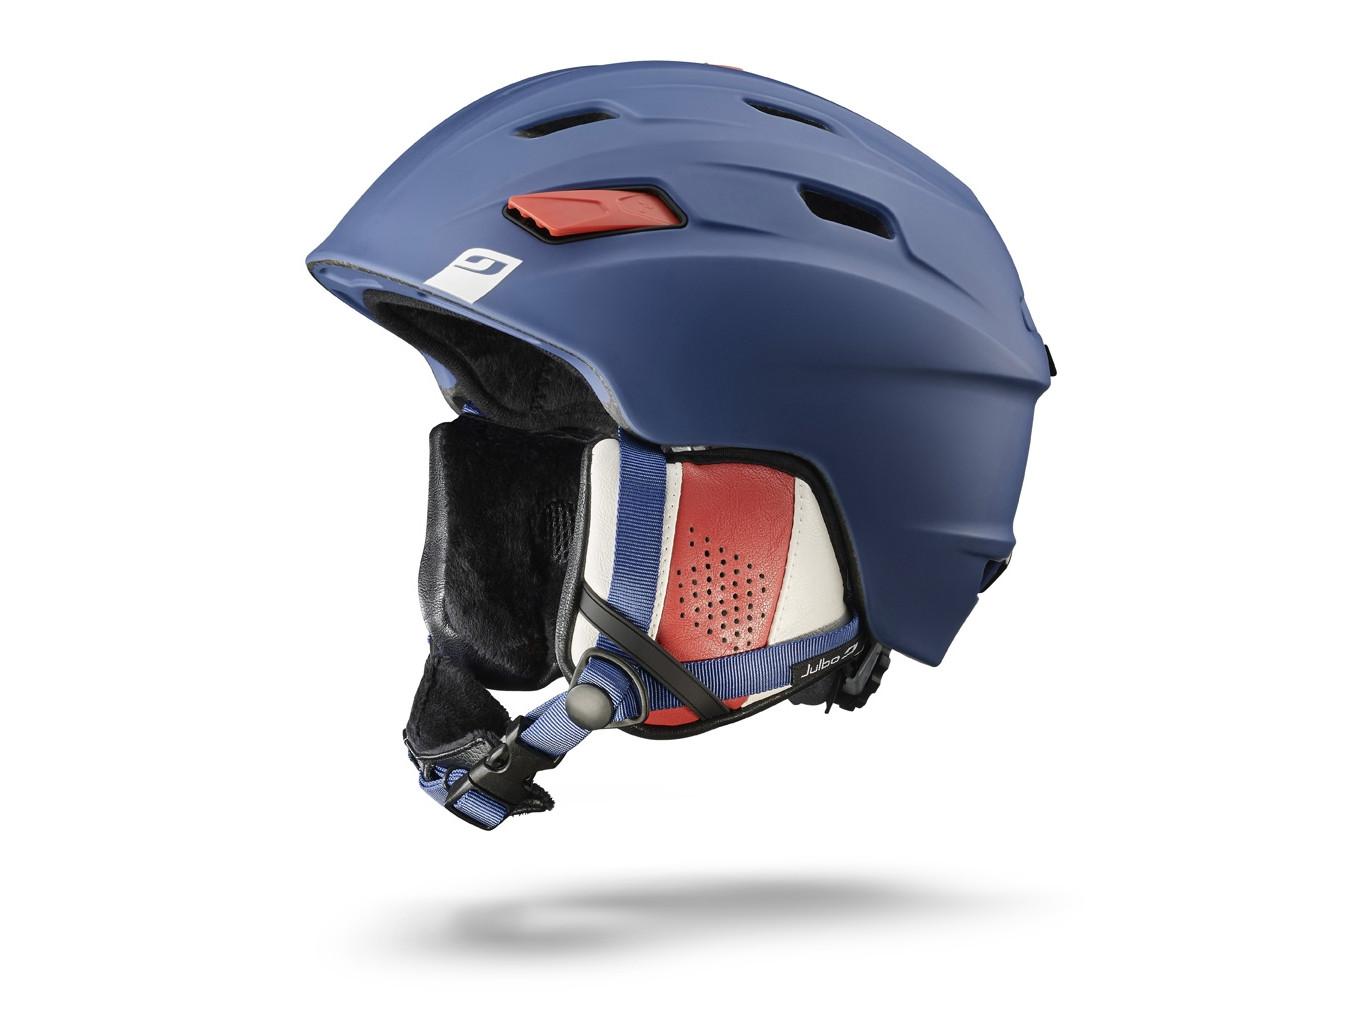 6df78e71cb4f75 Casque de ski mixte JULBO Bleu MISSION Bleu   Blanc   Rouge 58 60